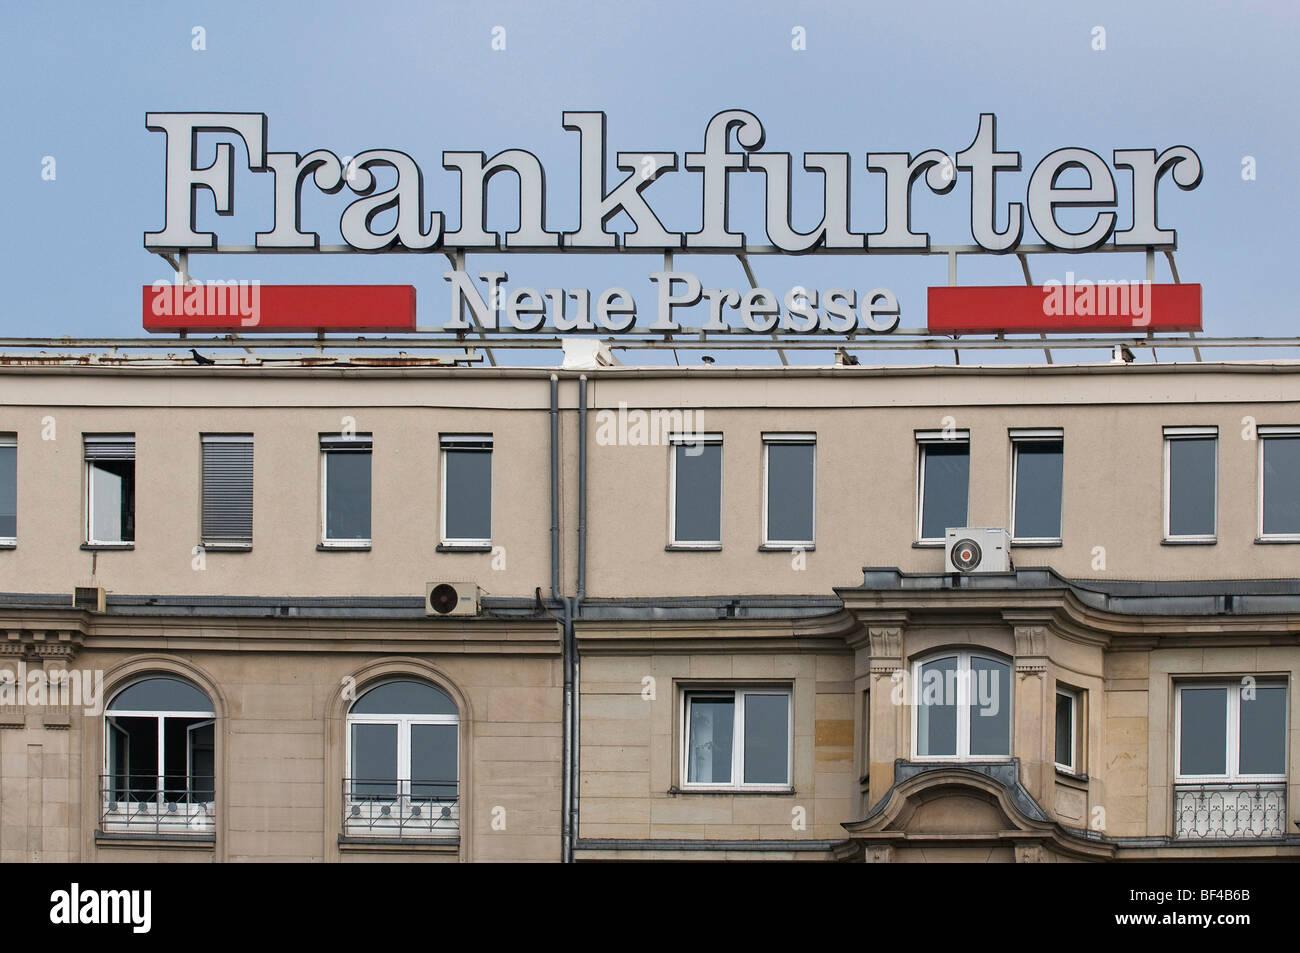 Frankfurter Neue Presse, FNP, German daily newspaper, logo on a building, Frankfurt am Main, Hesse, Germany, Europe - Stock Image